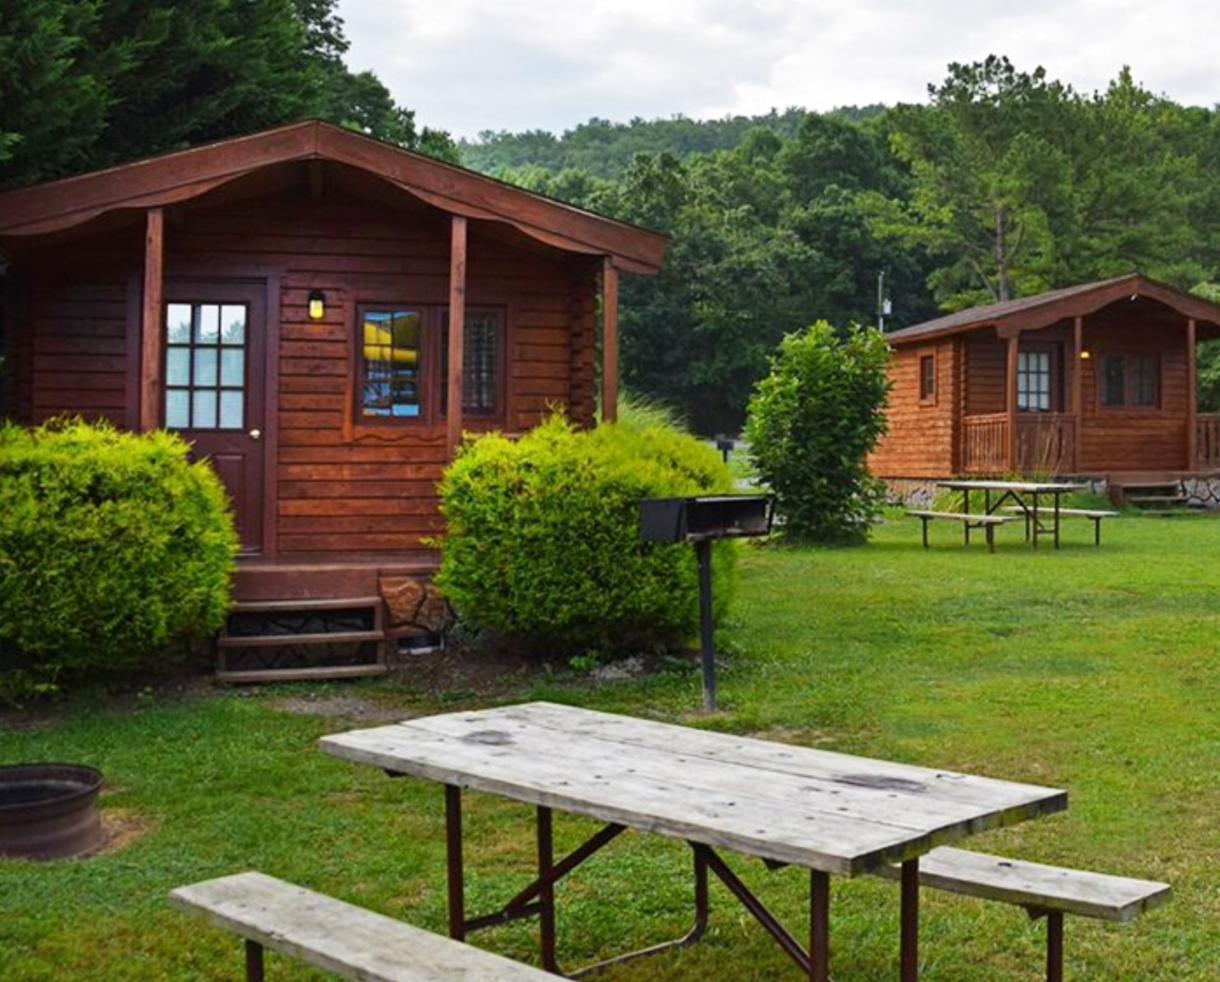 115 For 2 Night November Comfort Cabin Getaway At Luray